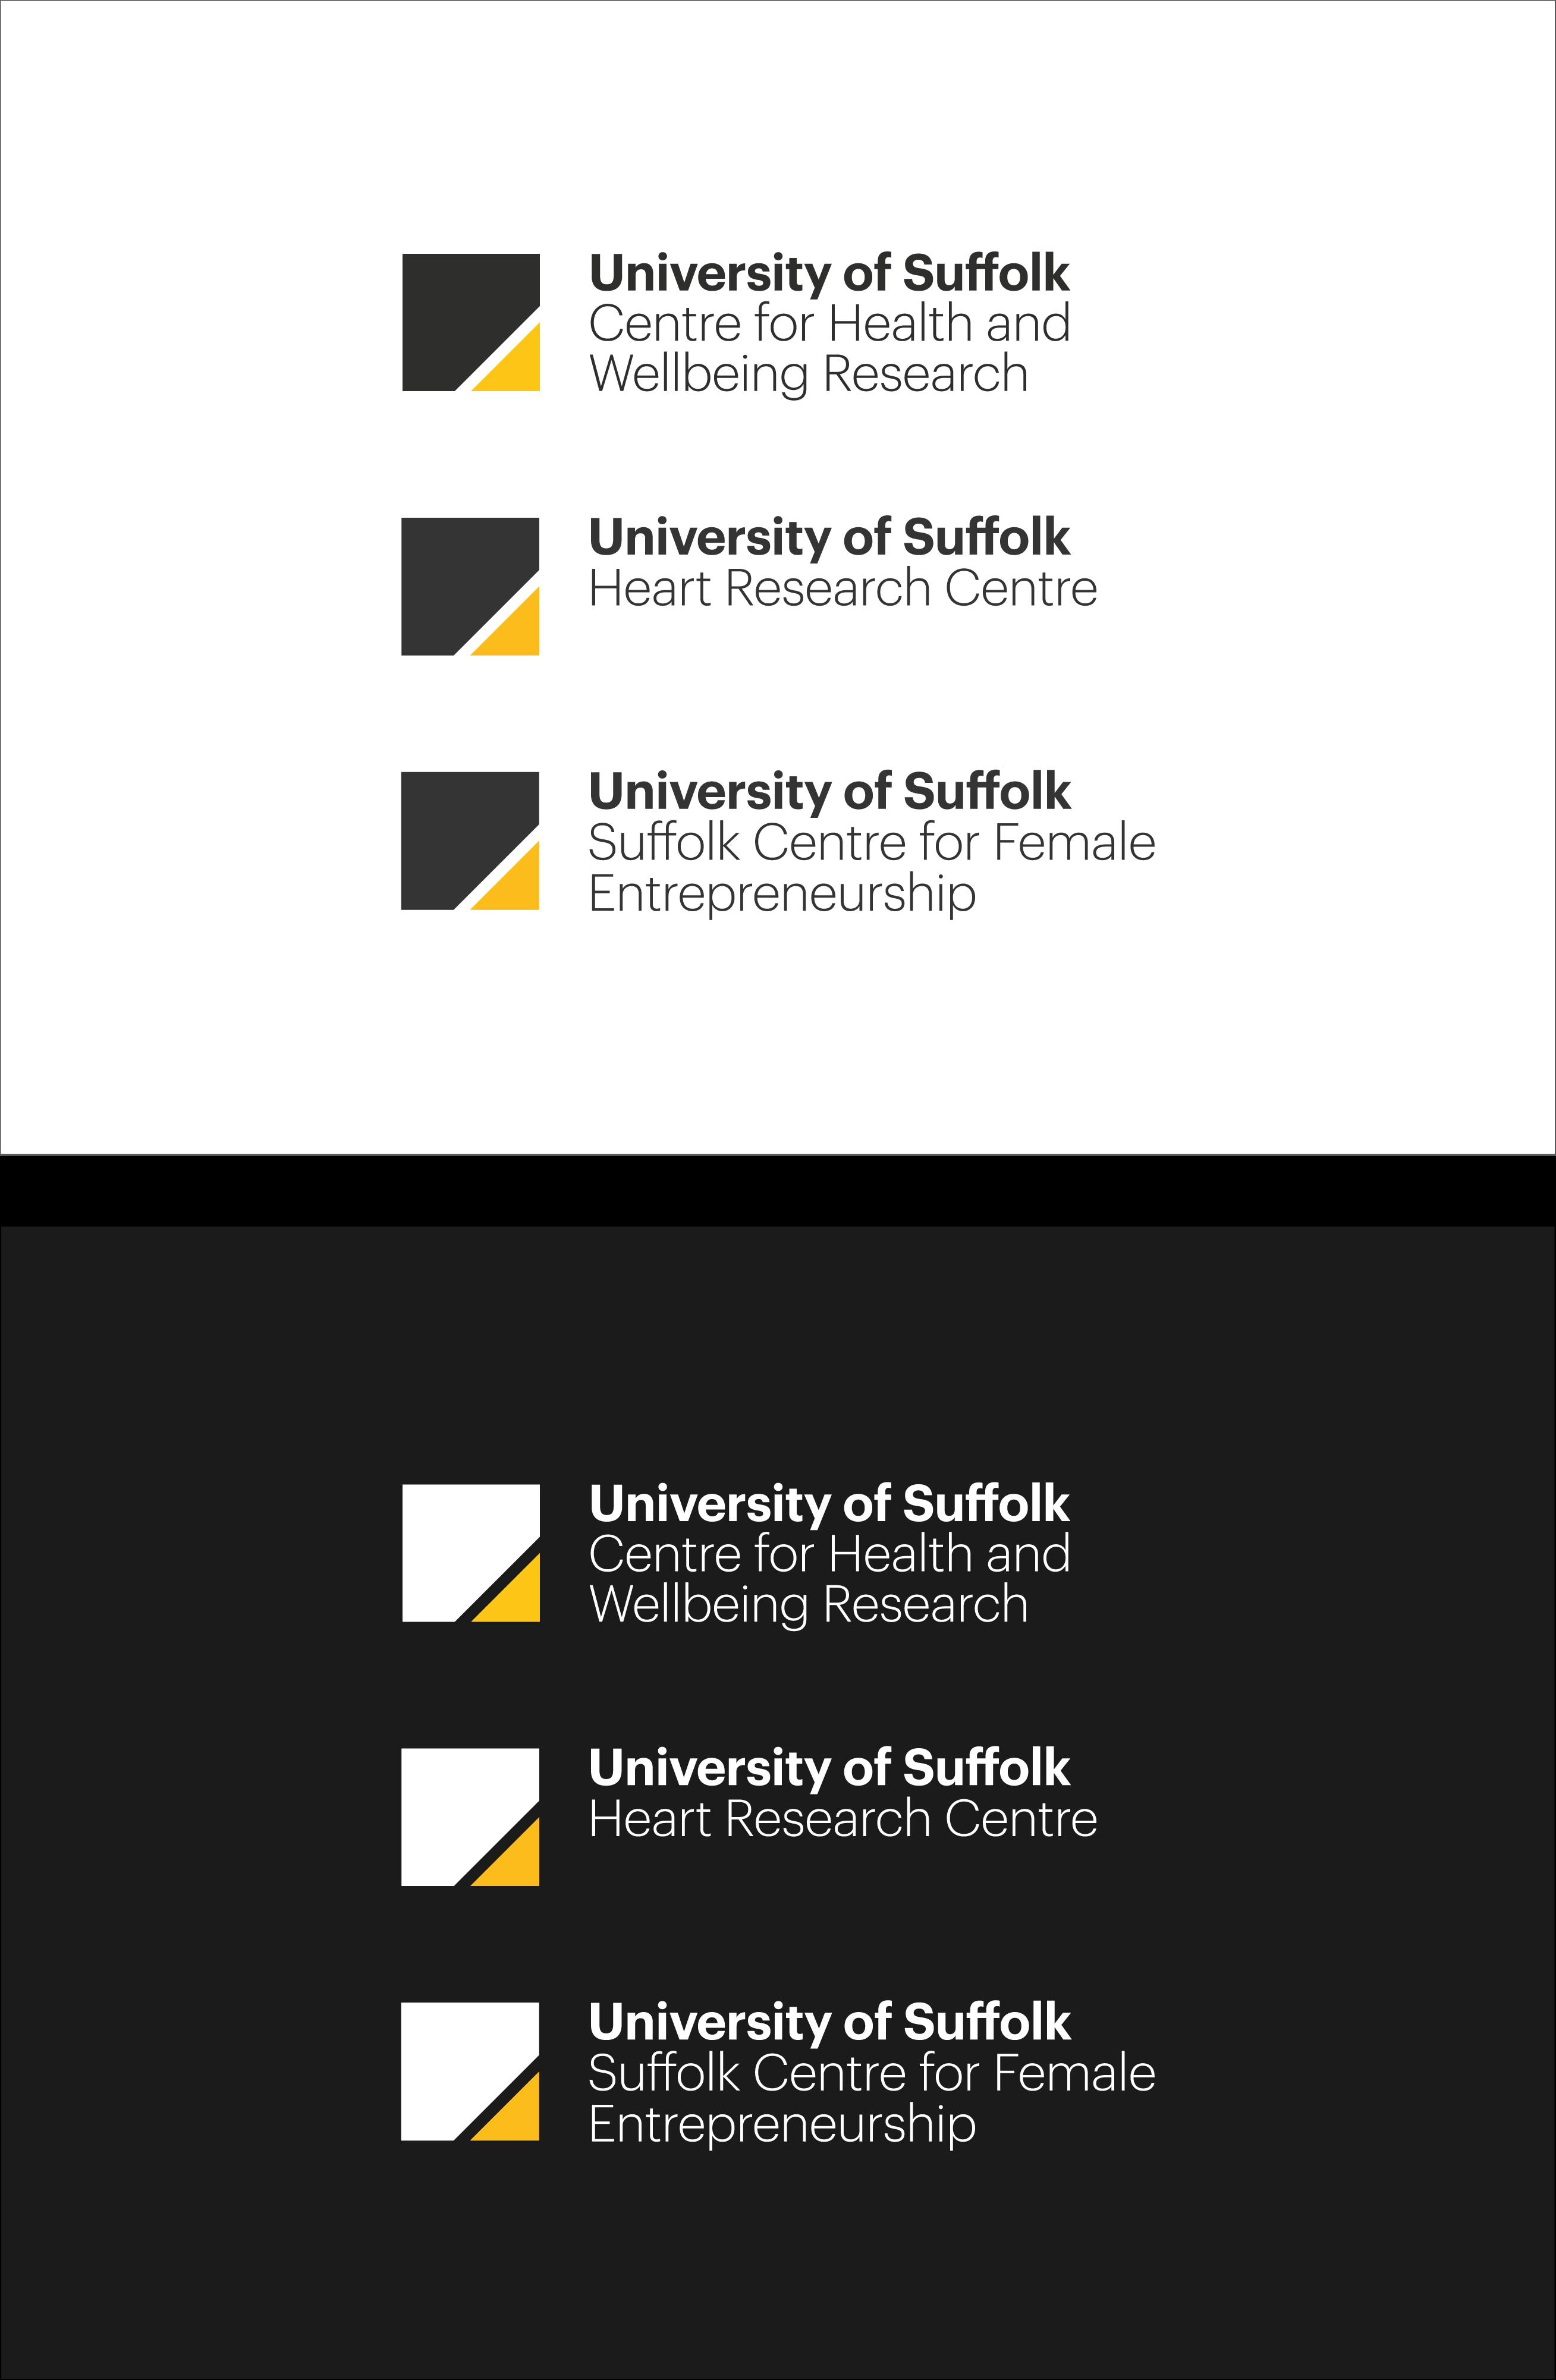 Logo - University of Suffolk